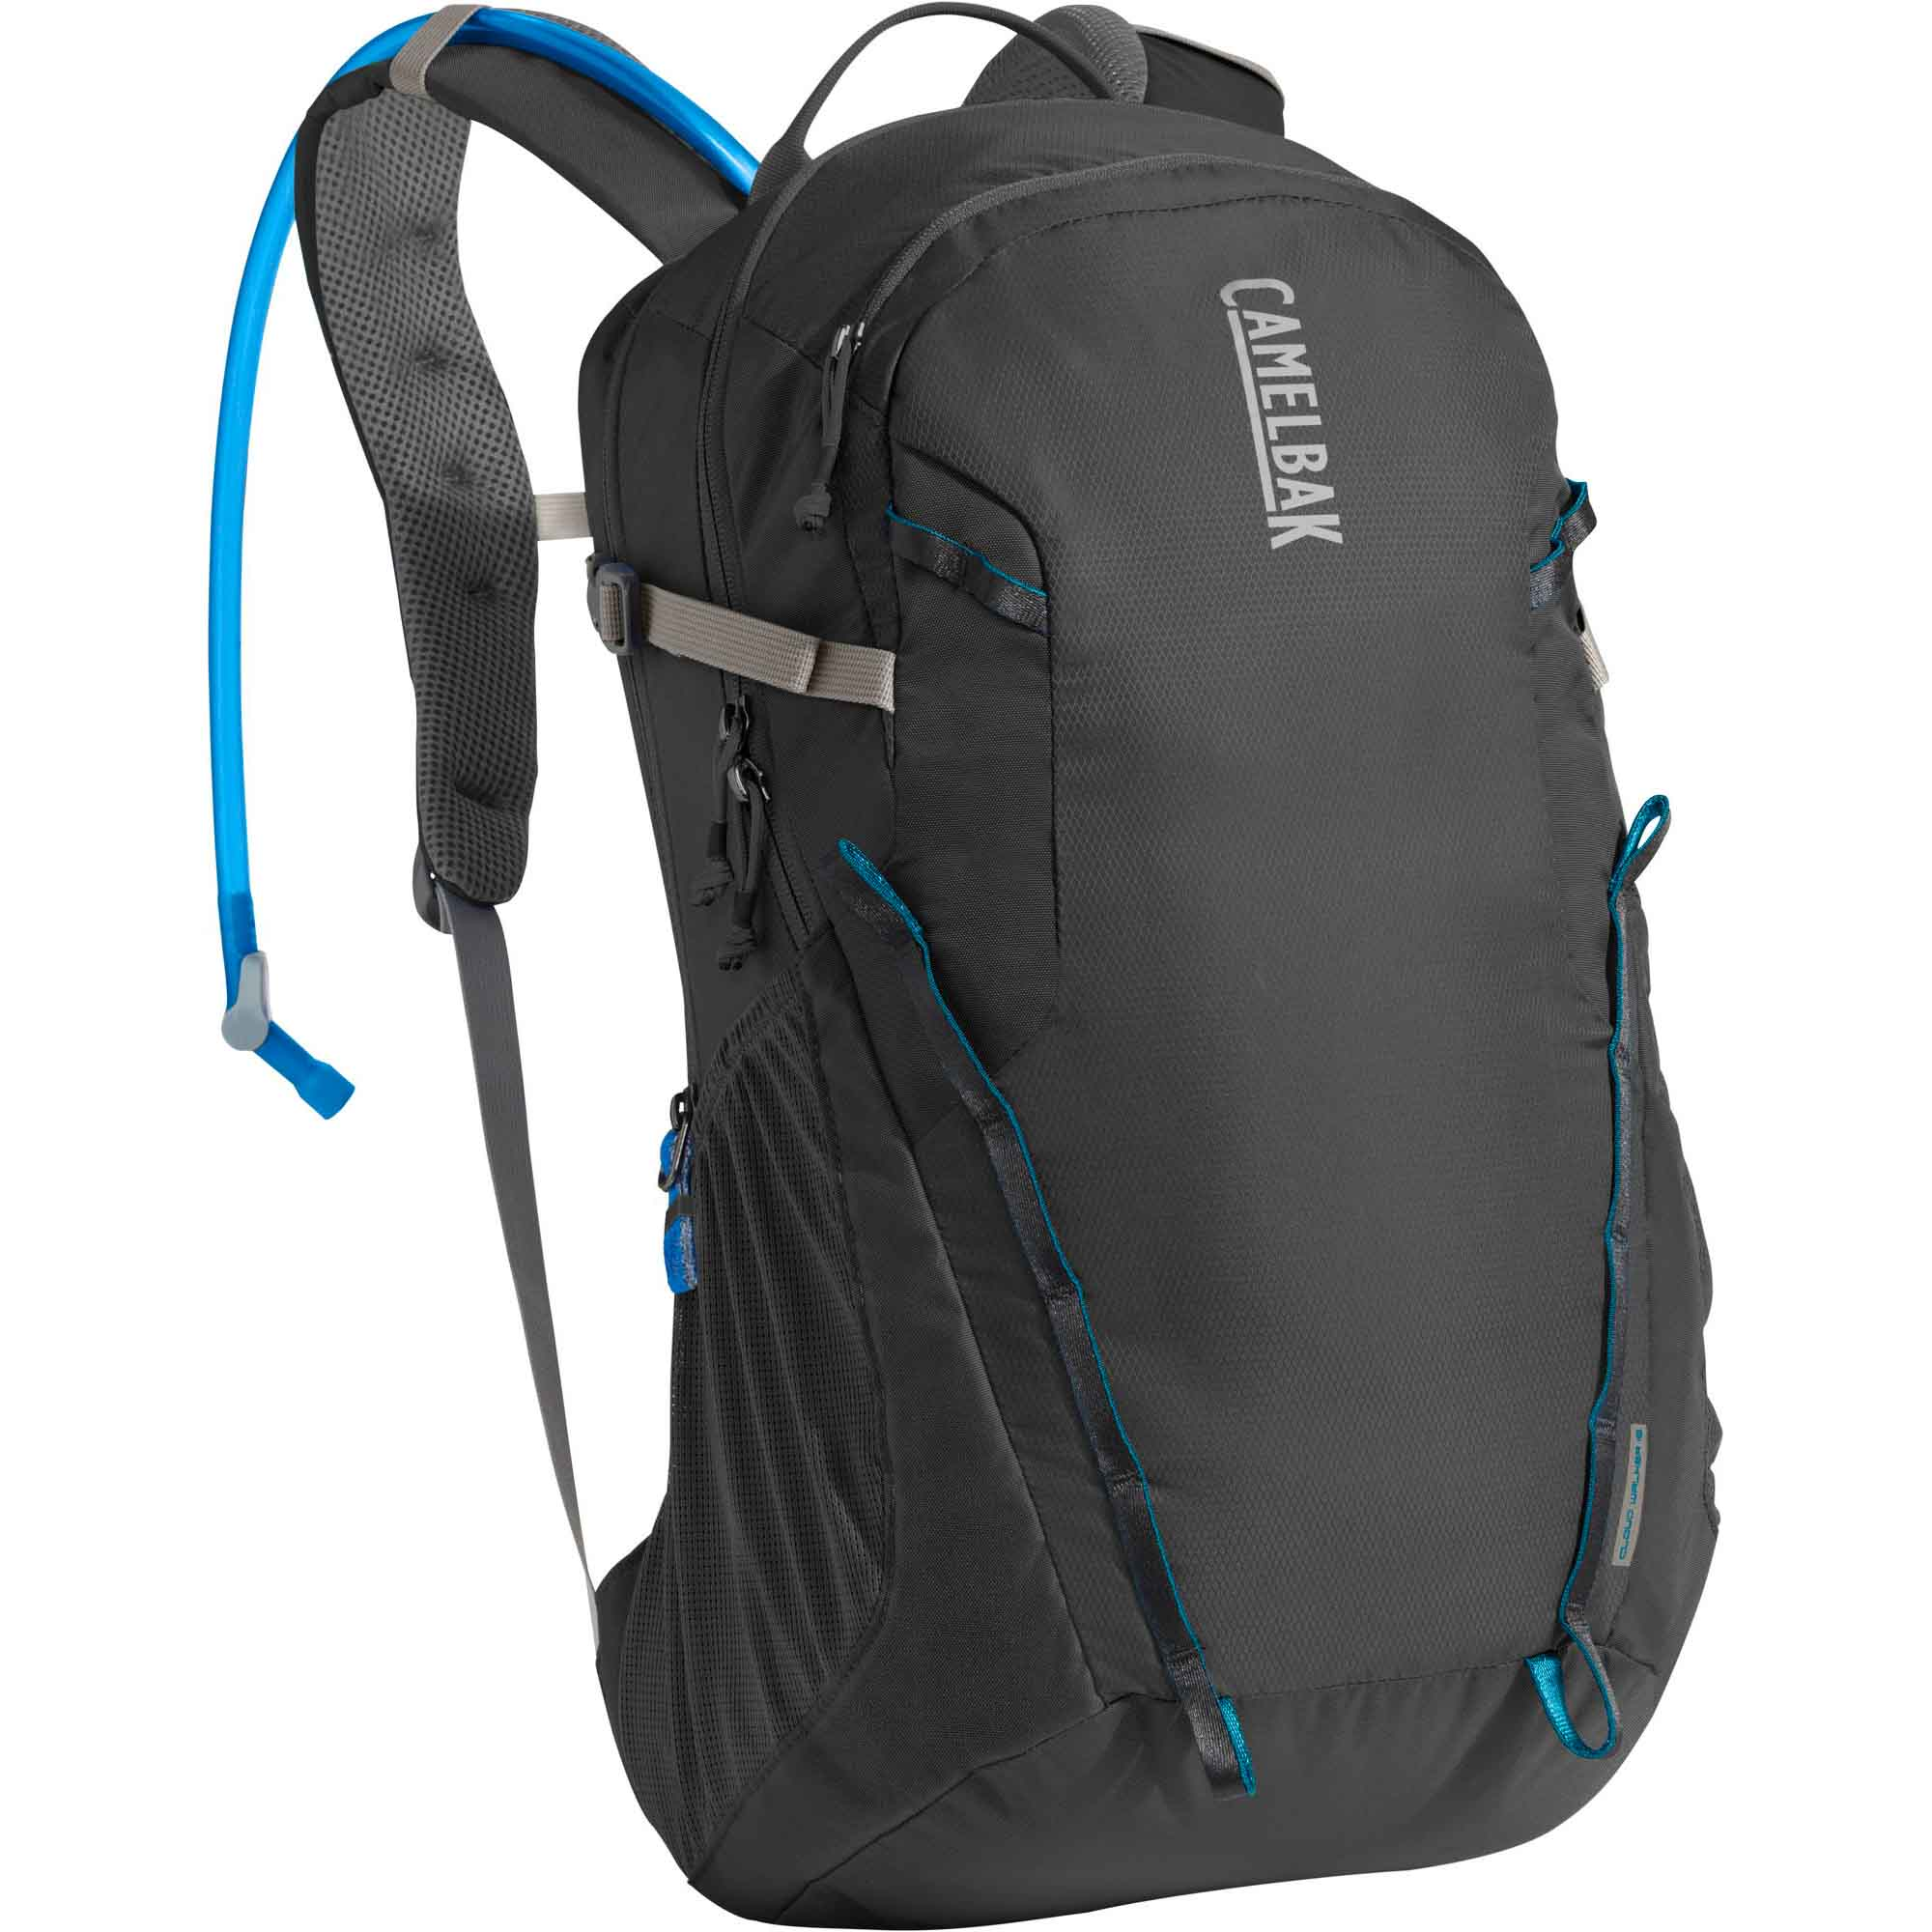 Camelbak Cloud Walker 18 Hydration Hiking Backpack